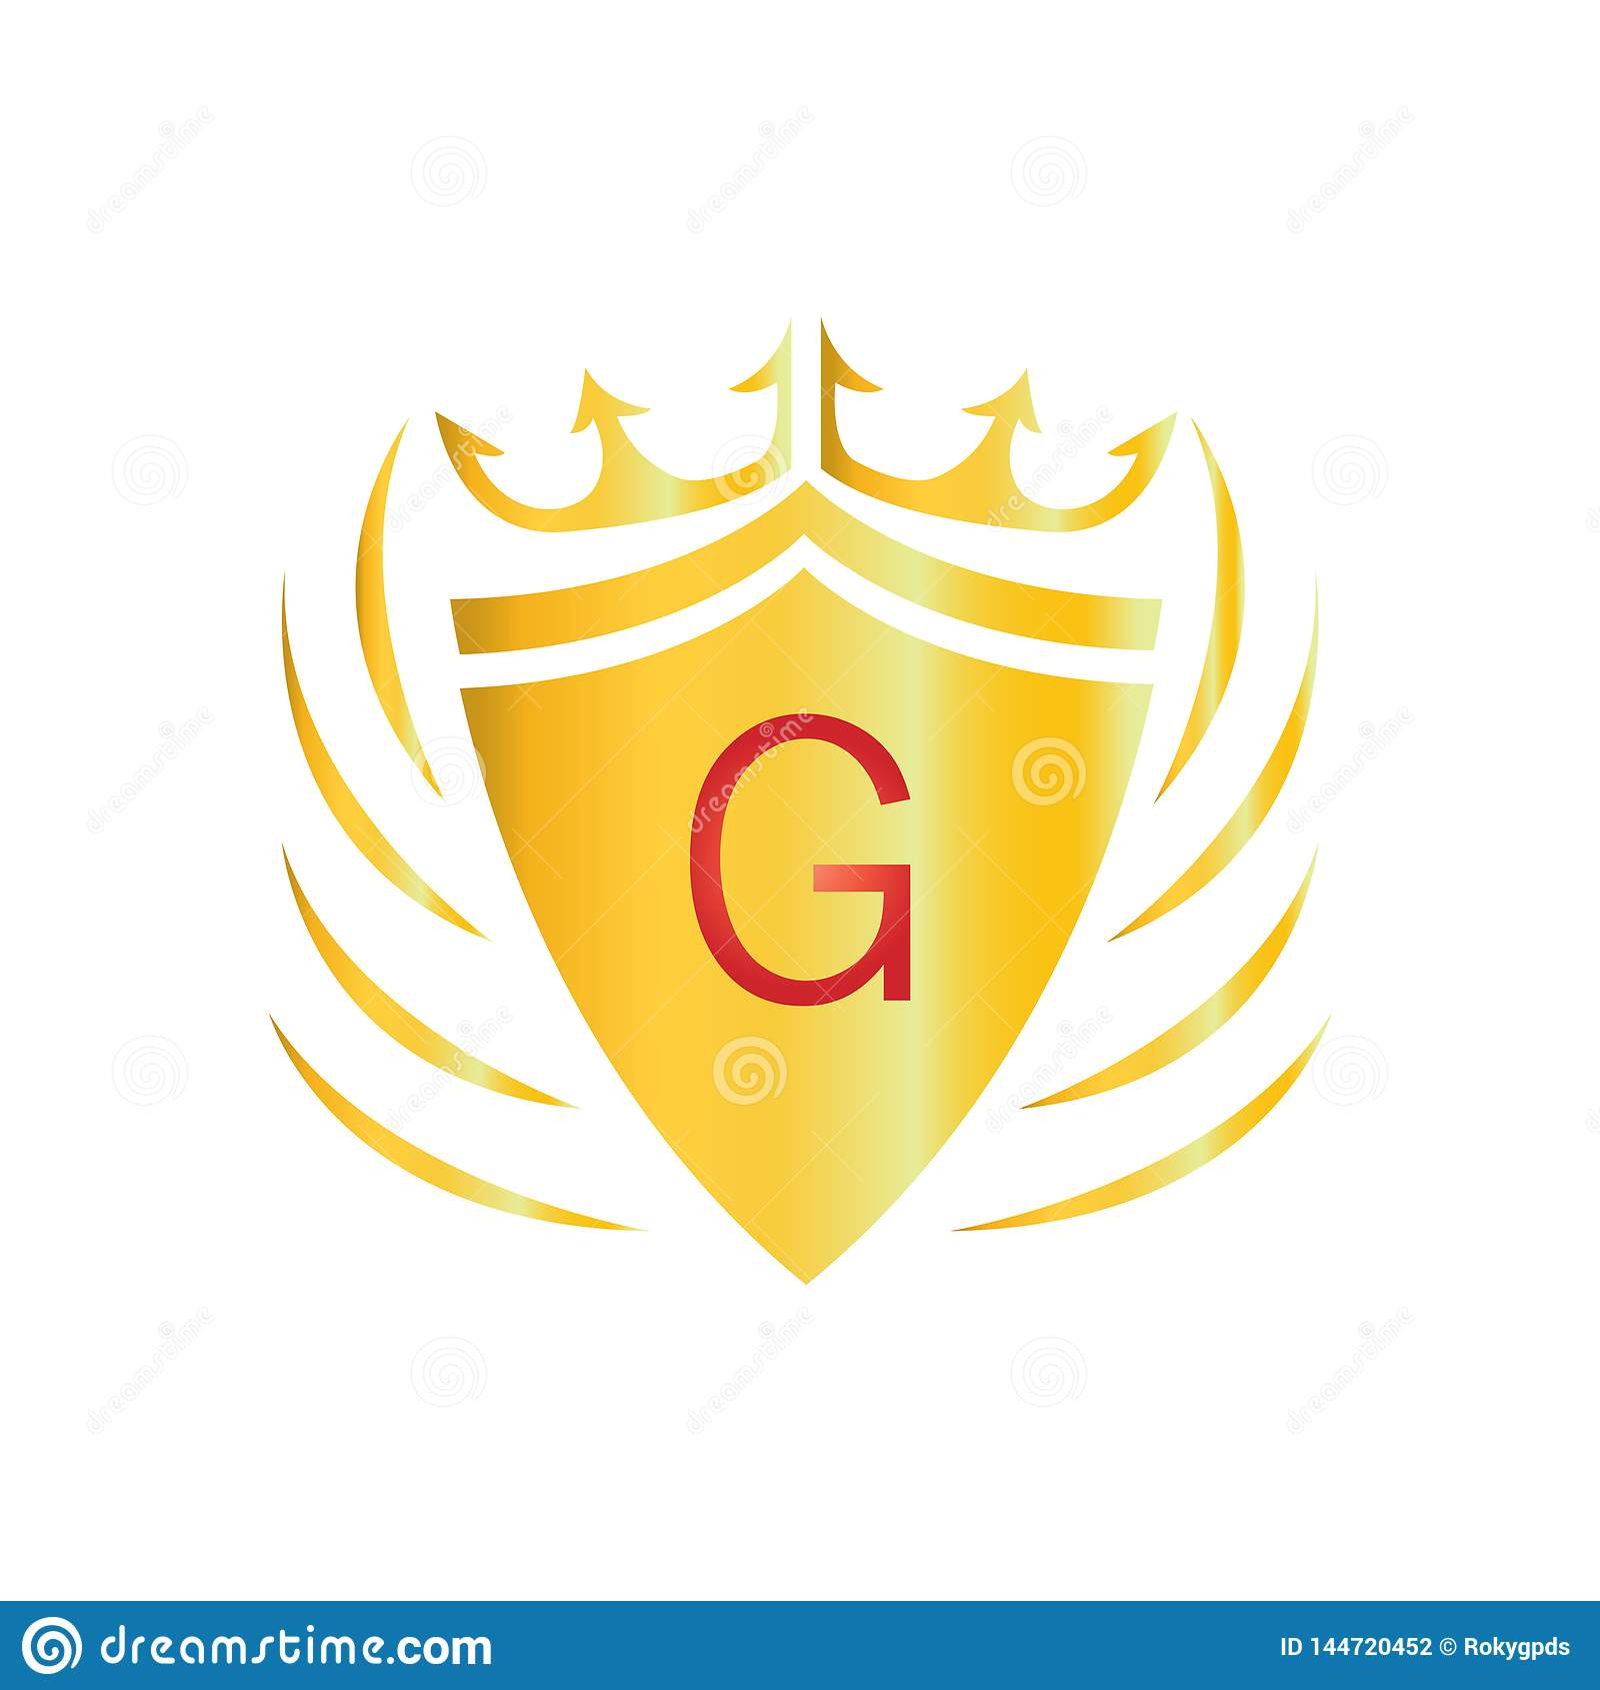 Royal Crown Logo. Letter G logo